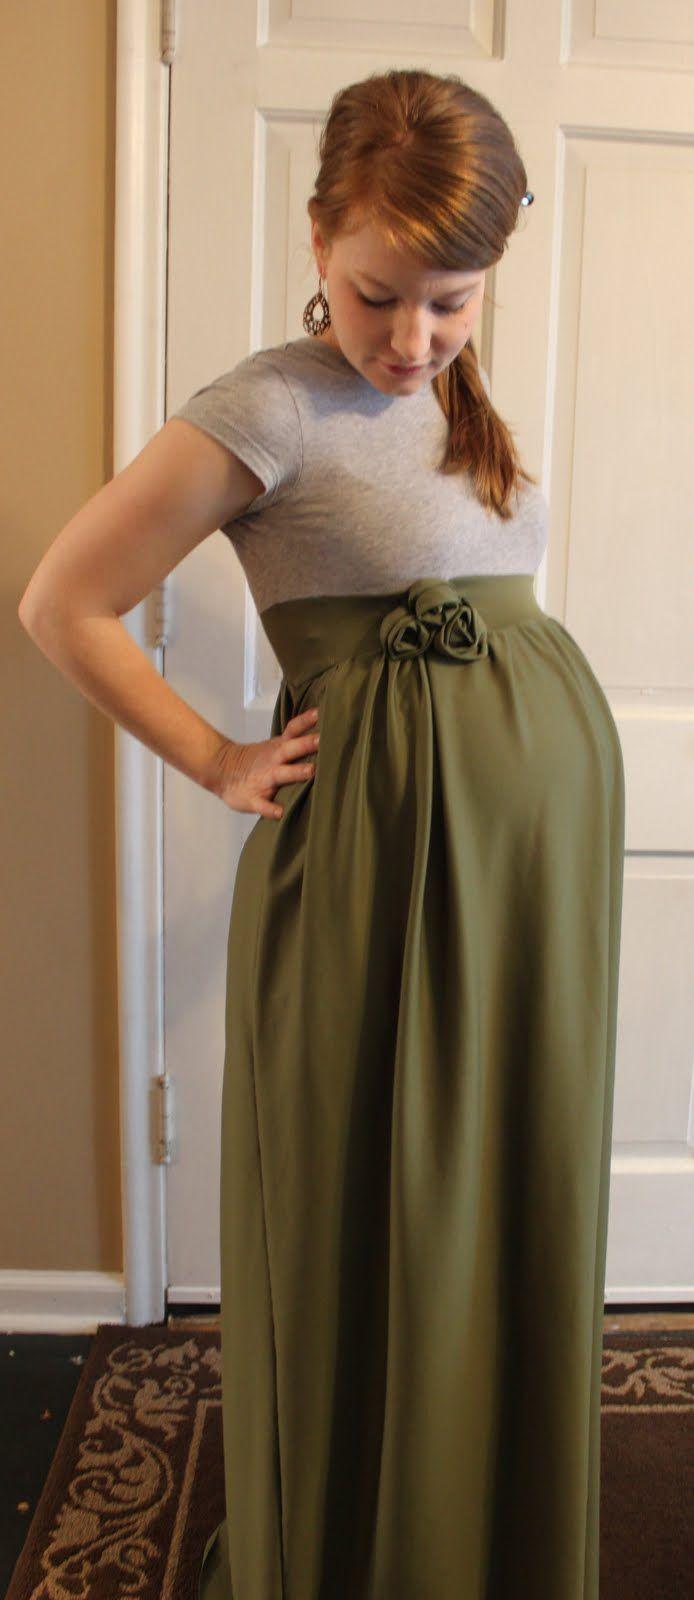 DIY maternity dress! I absolutely love it!